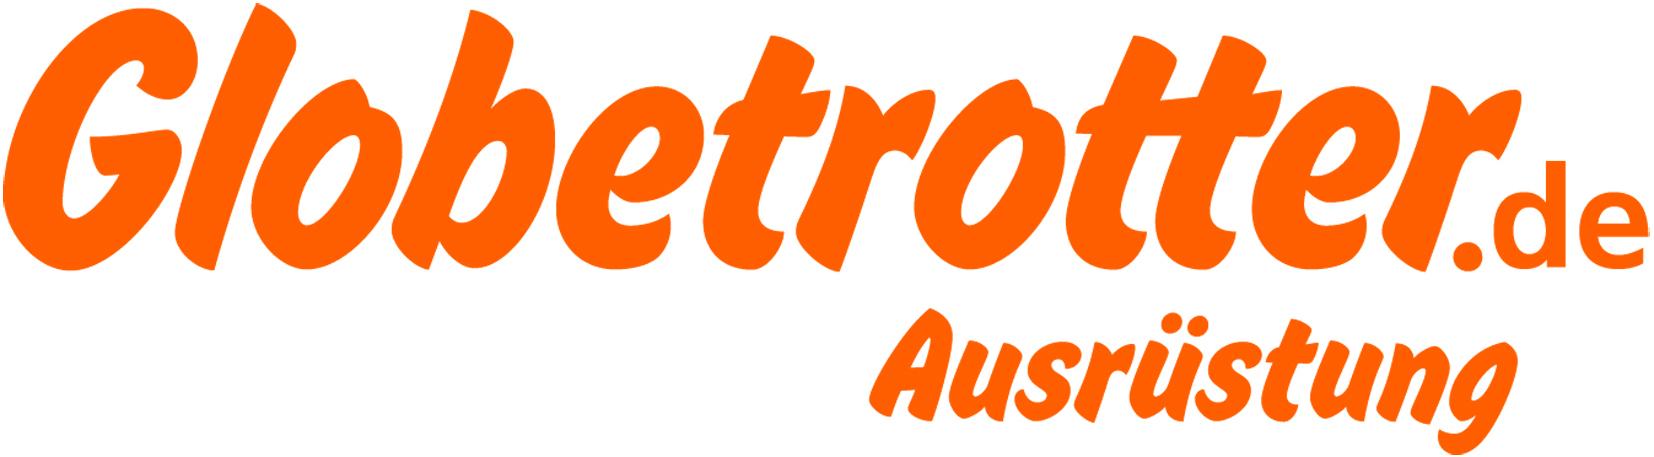 logo-globetrotter_orange